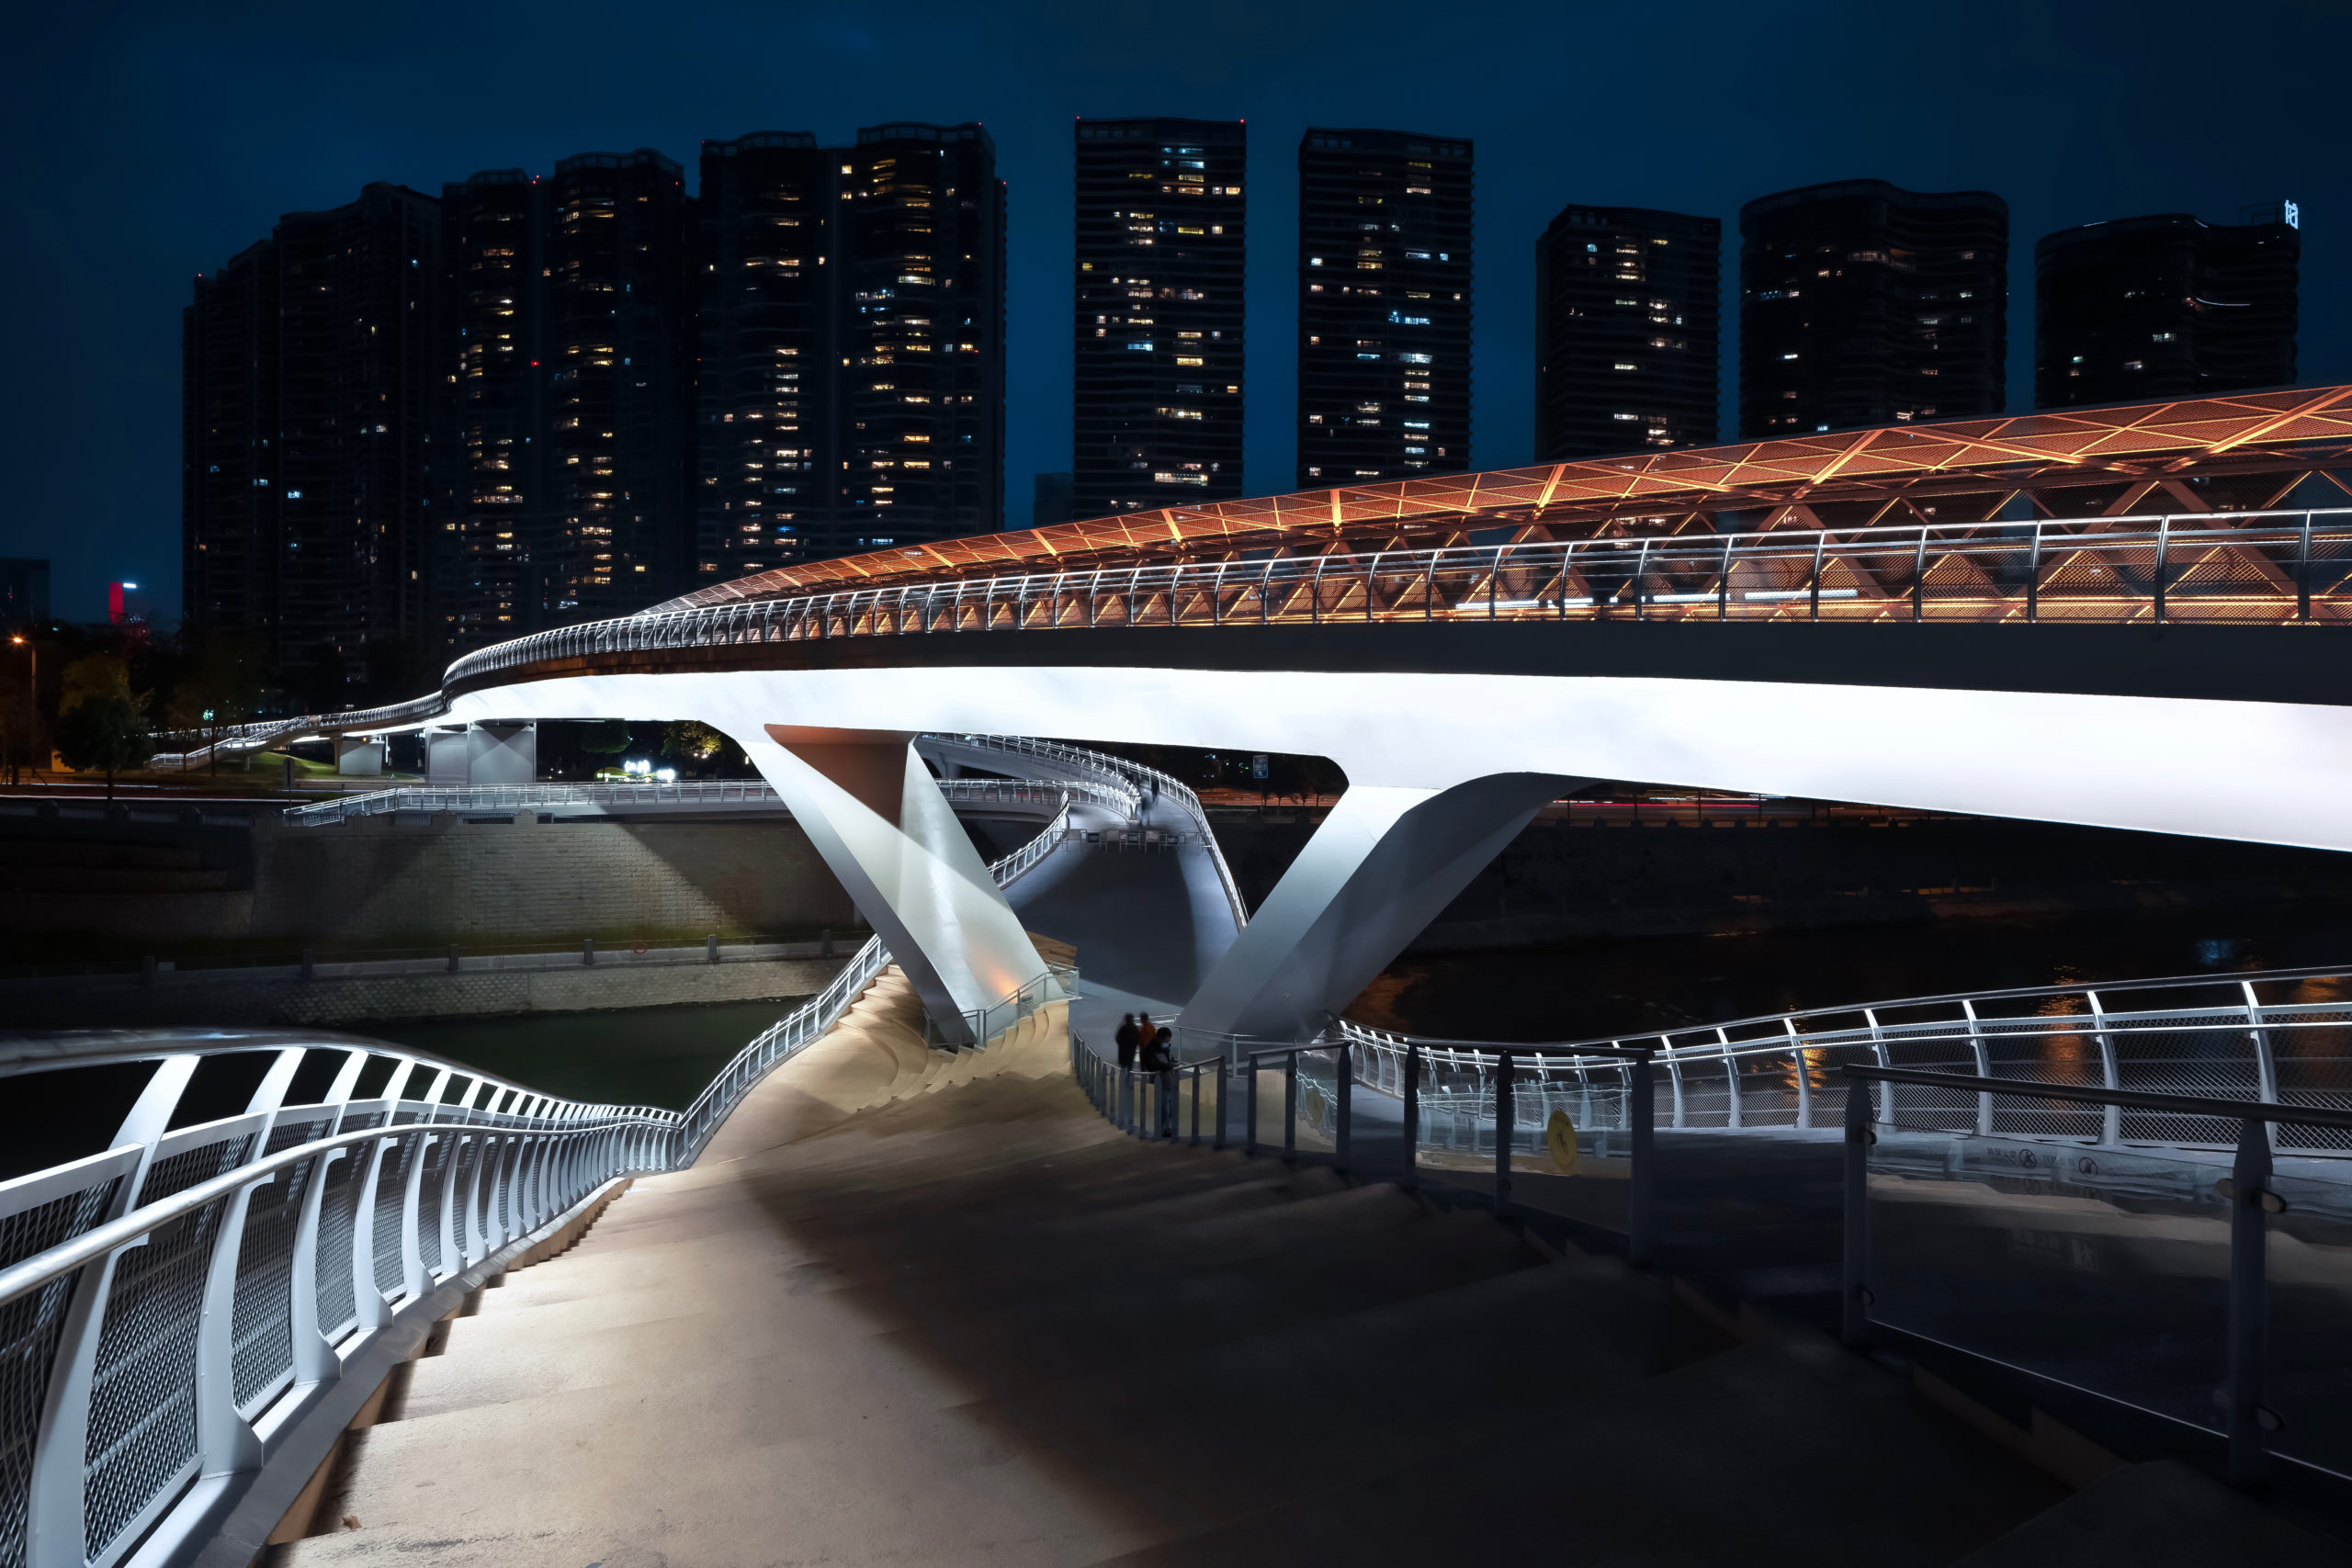 五岔子大橋 Wuchazi Bridge Night View showing the Stairs